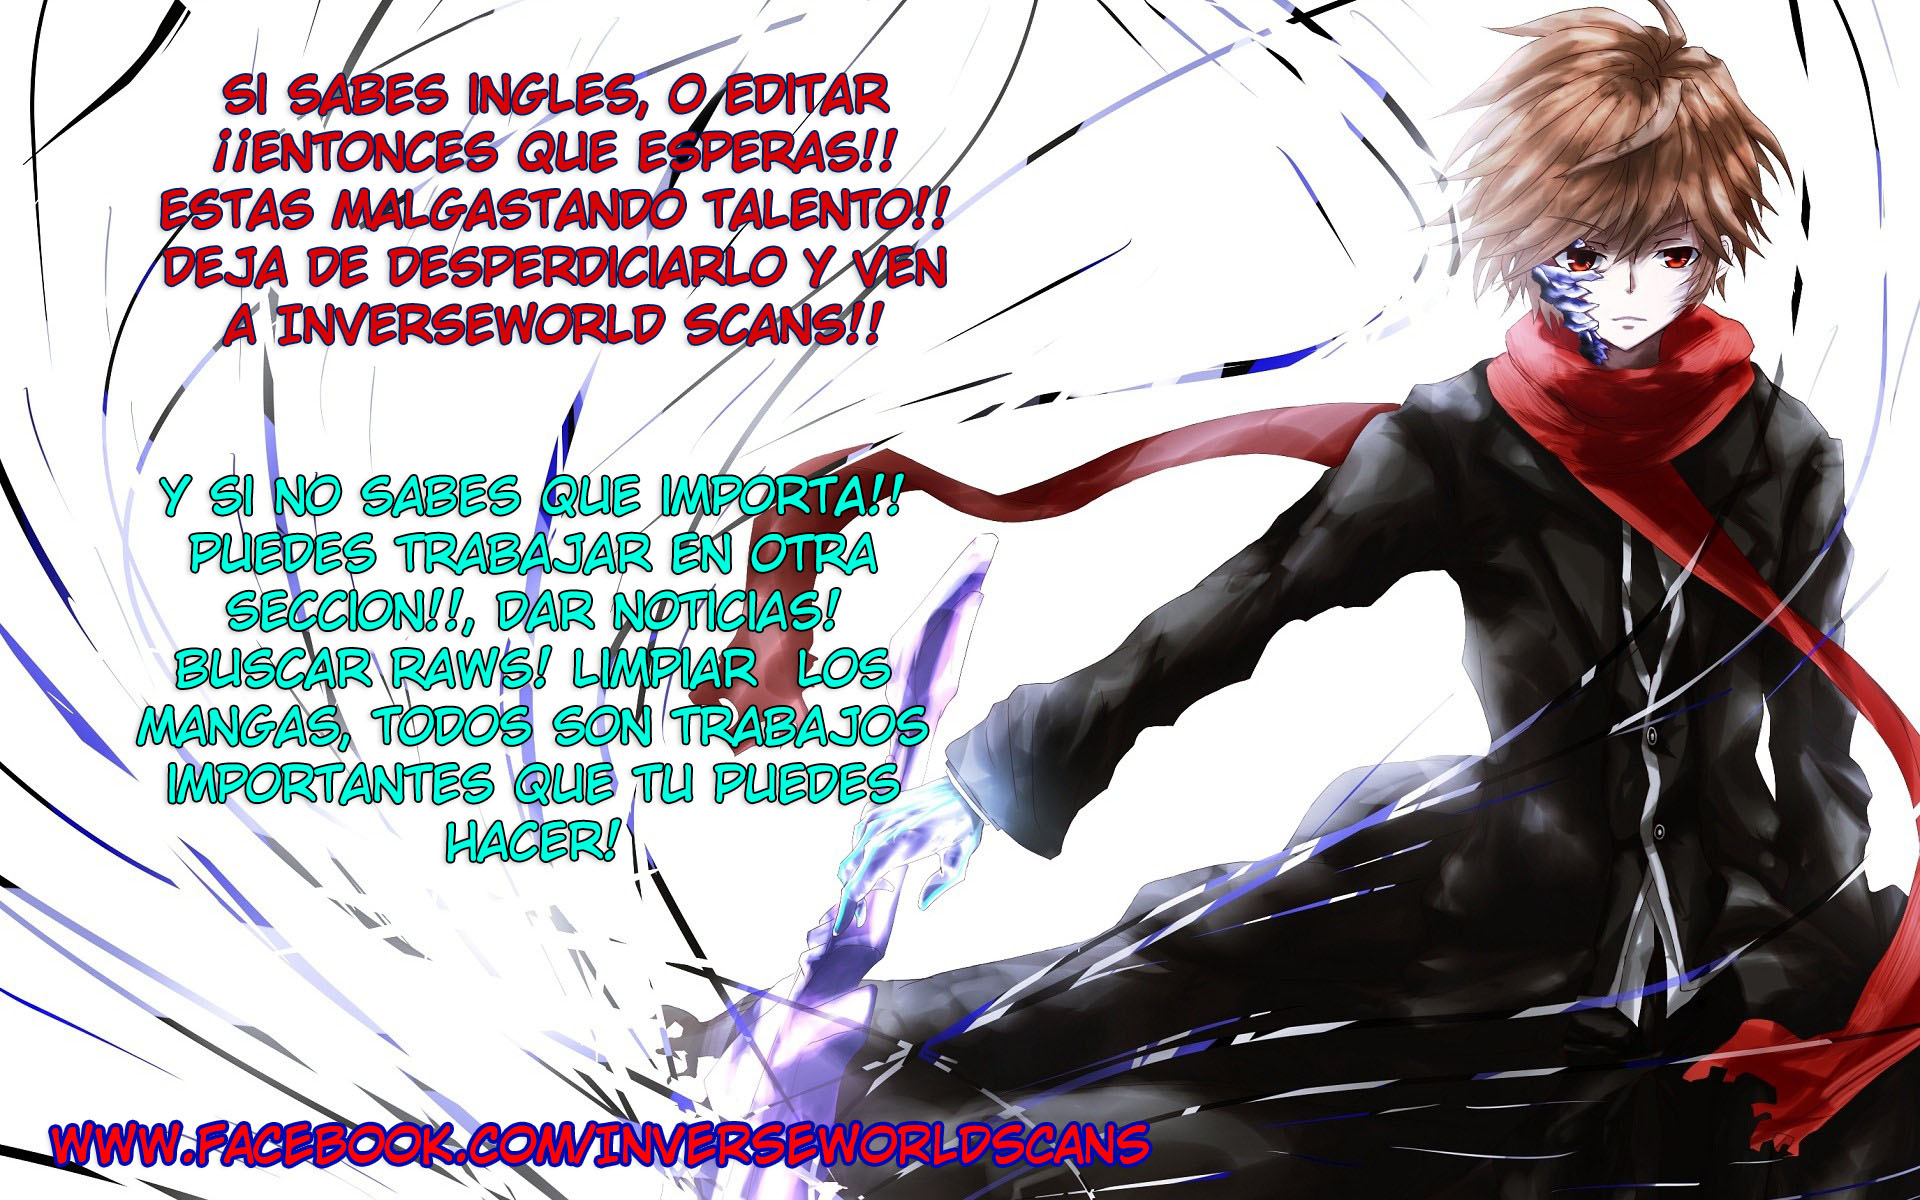 http://c5.ninemanga.com/es_manga/18/16210/415343/bcb81f06fa3dcfff37054d19ea06147f.jpg Page 2